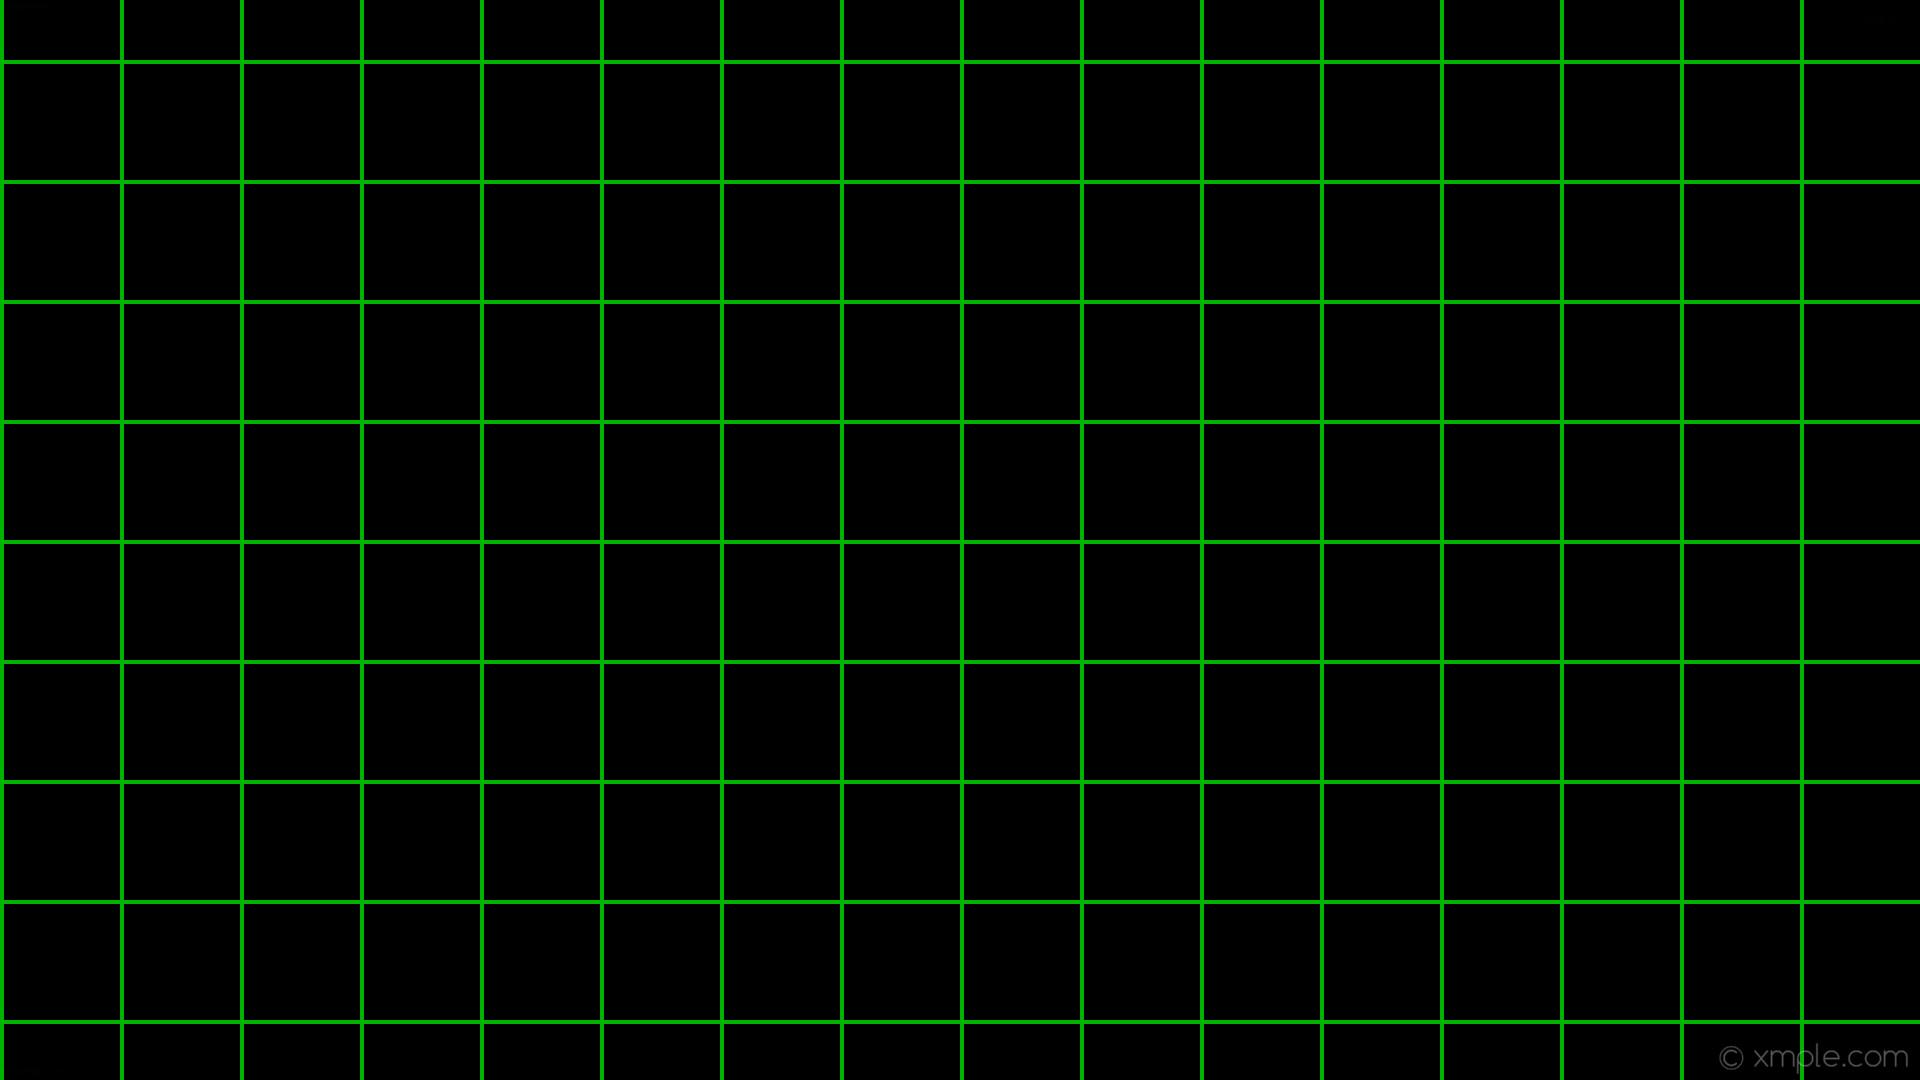 wallpaper graph paper black green grid lime #000000 #00ff00 0° 4px 120px